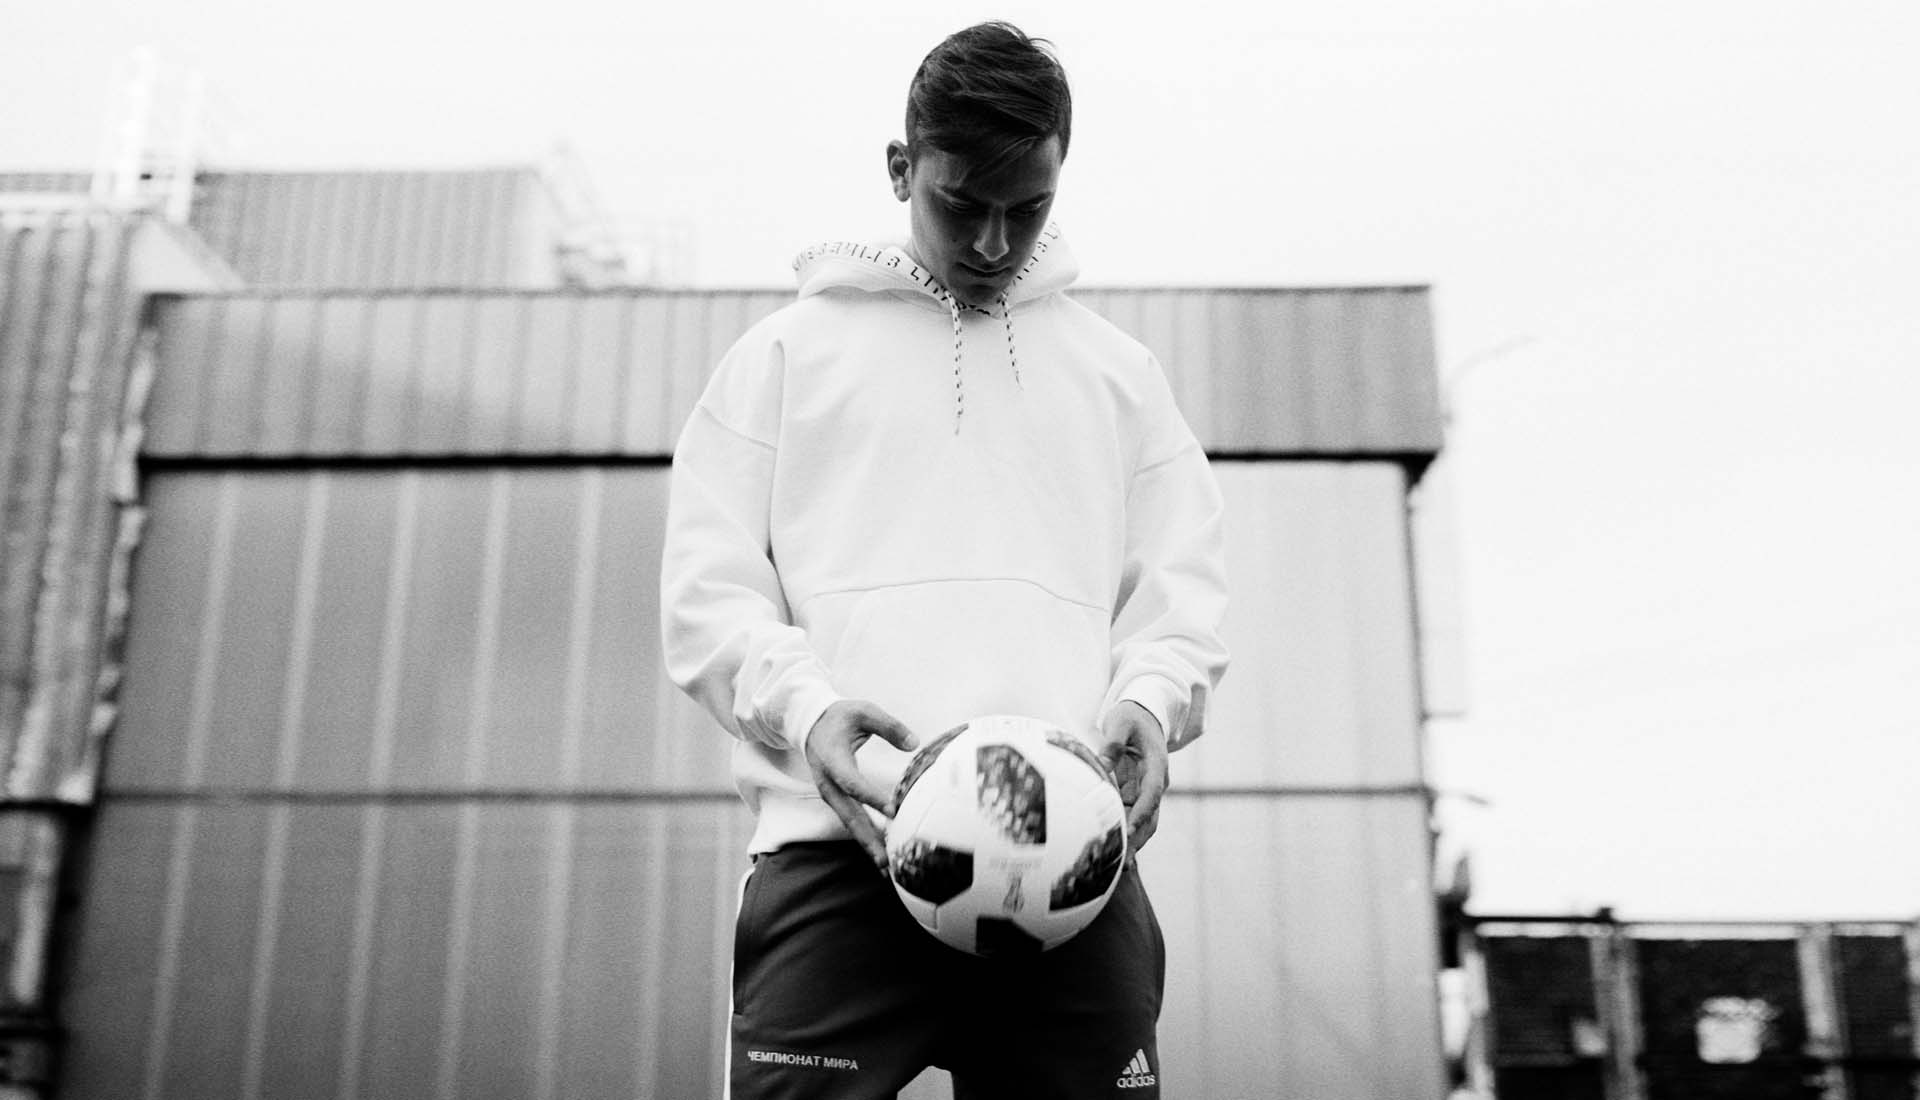 665ec6d67e7c17 Paulo Dybala Talks Argentina & World Cup For SoccerBible '32/12 ...